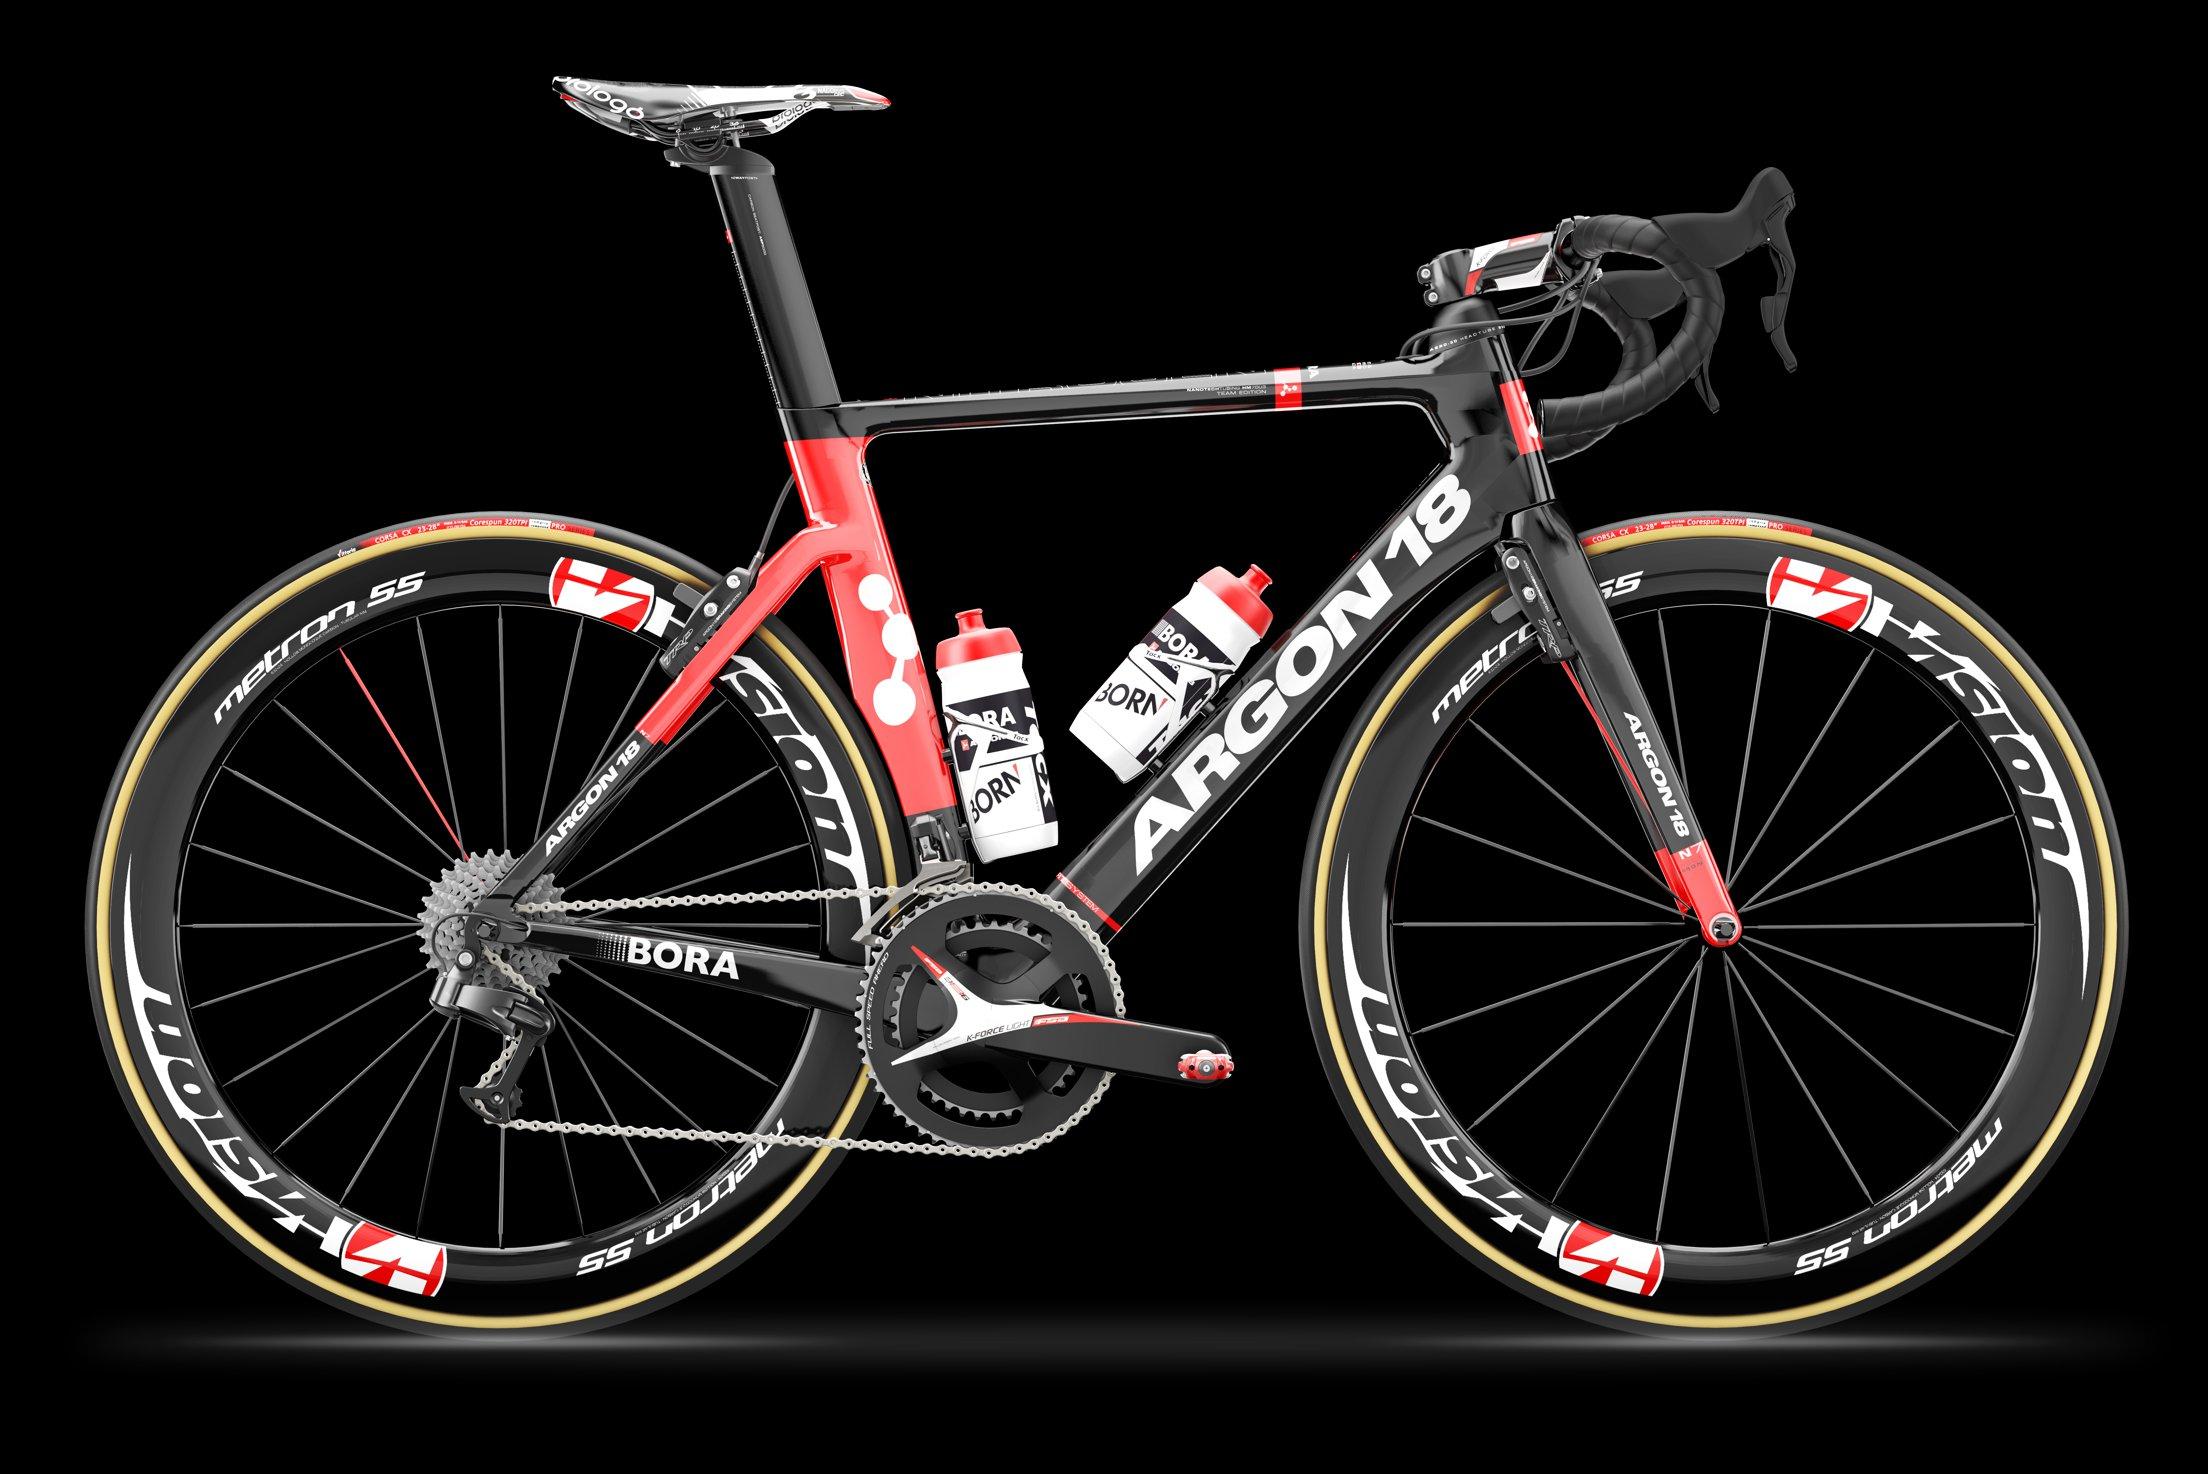 Teambike Bora - Argon 18 Nitrogen 2015